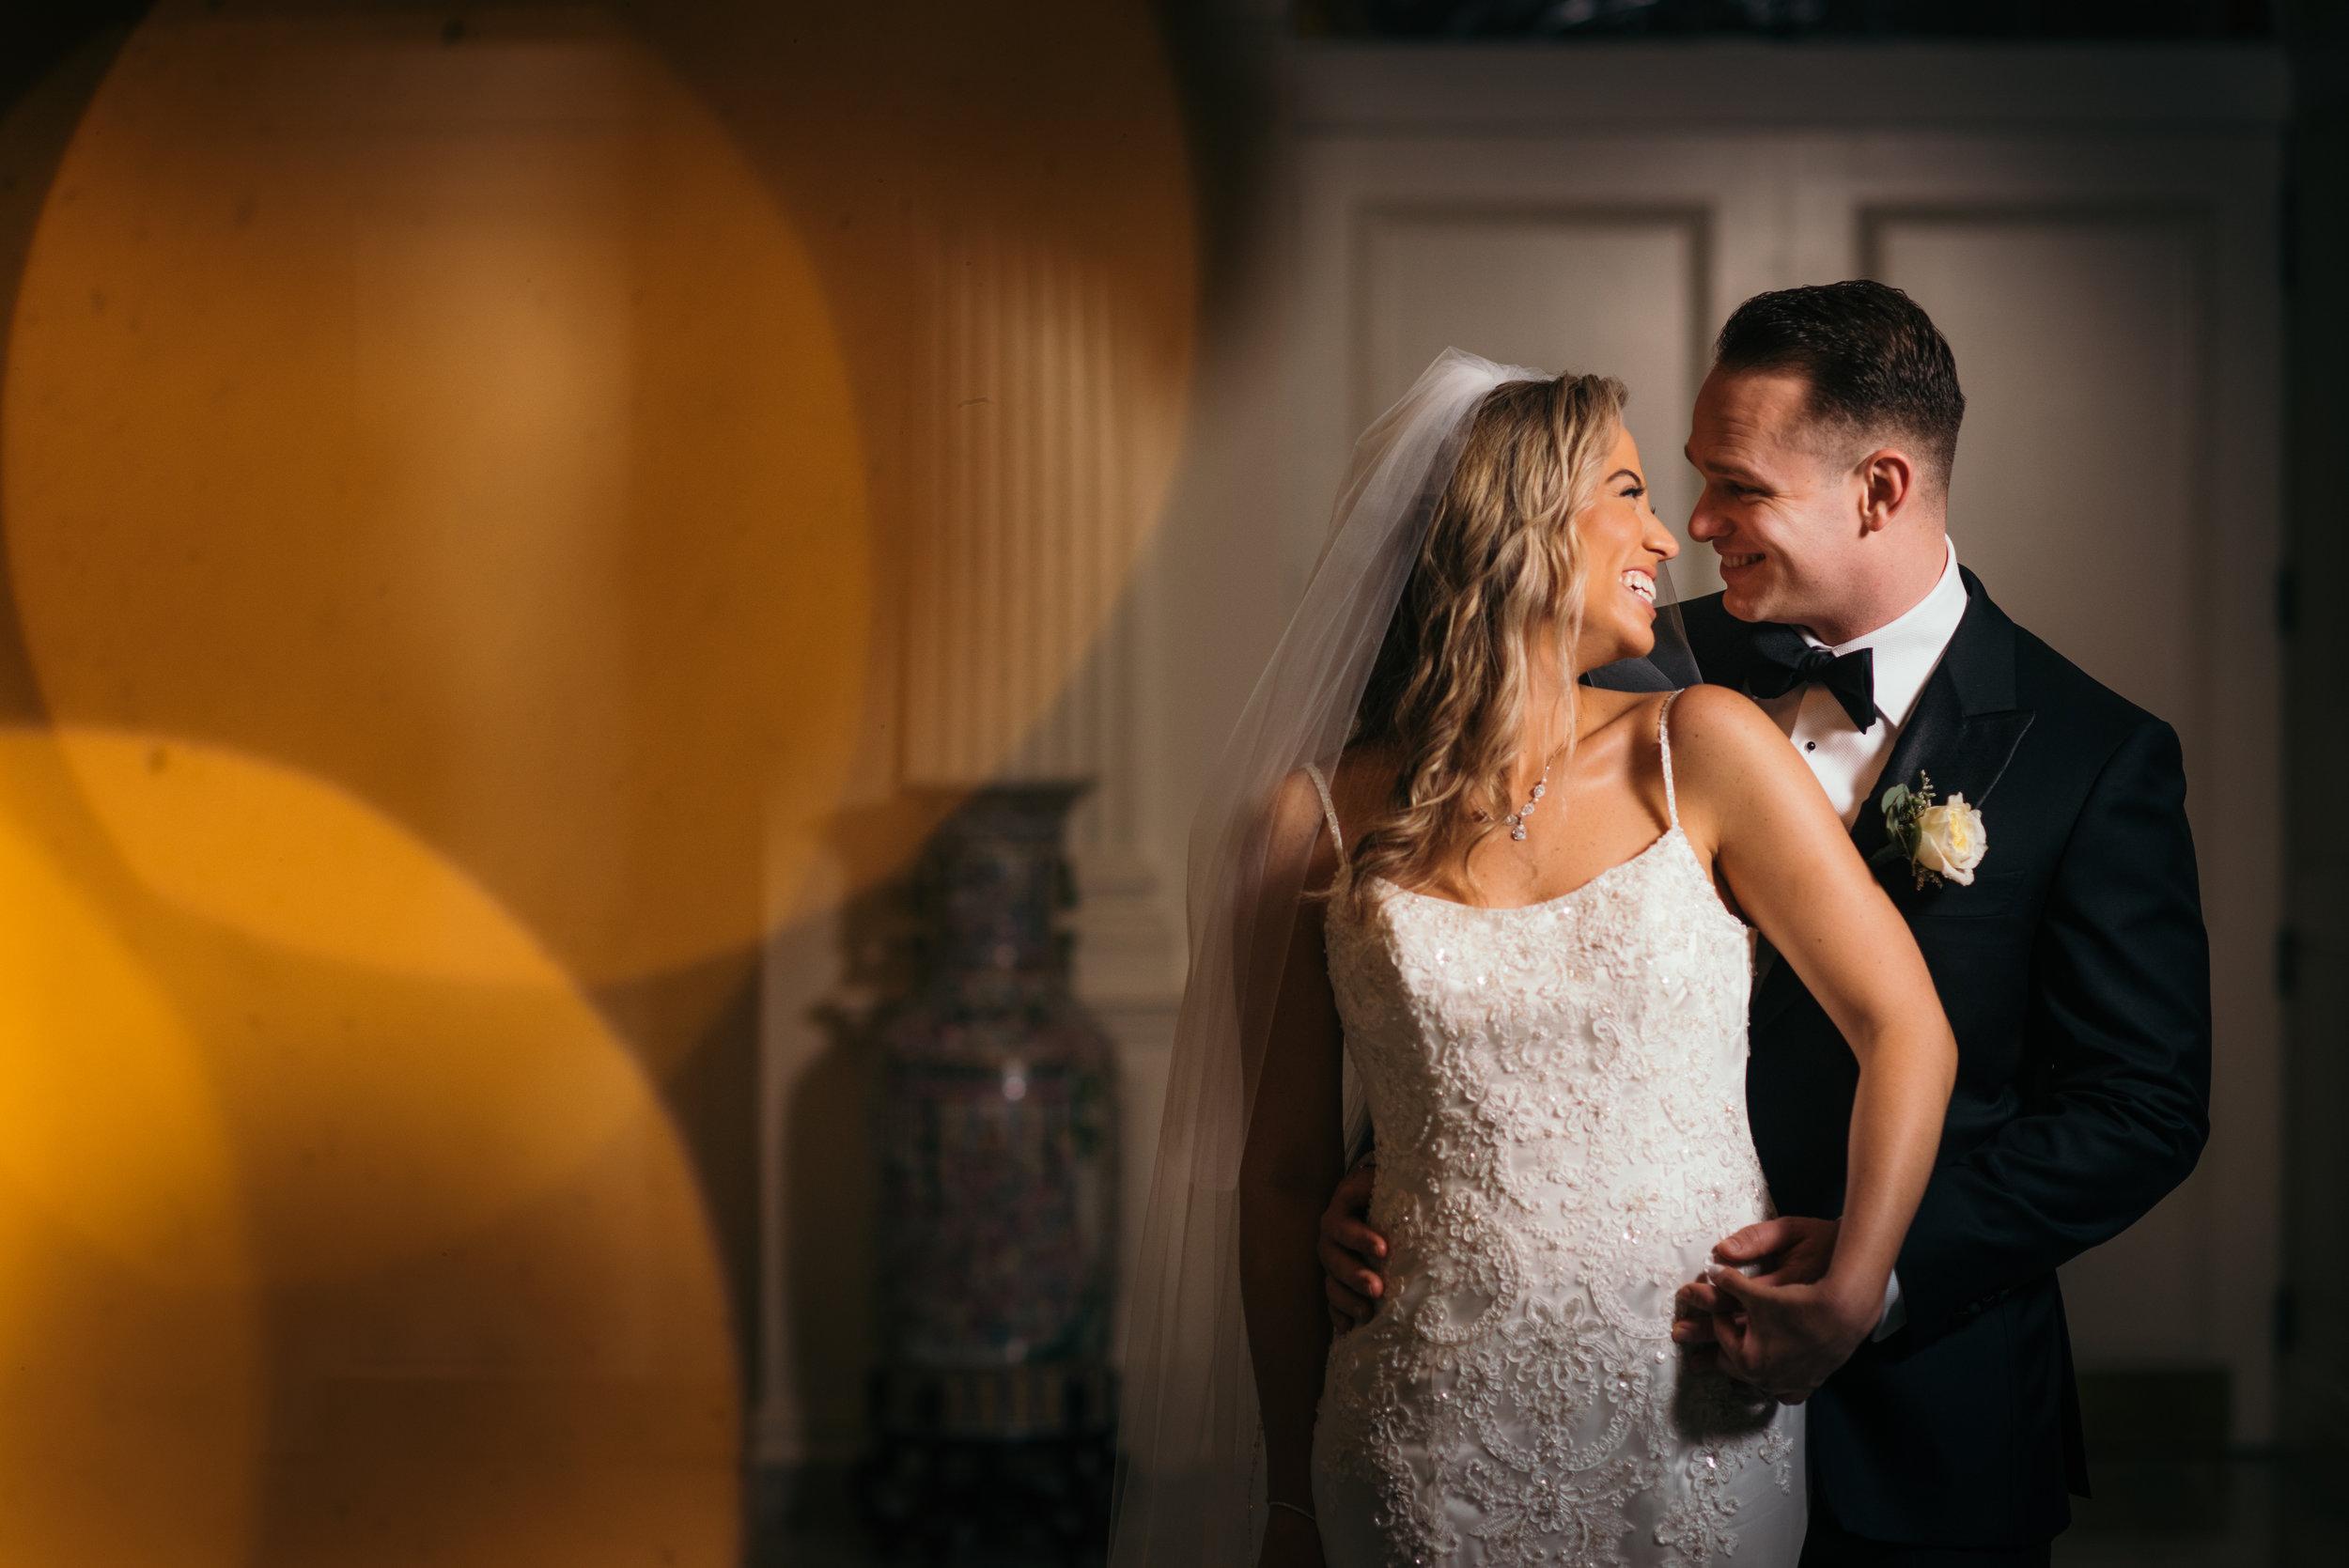 WeddingPhotos | NJPhotographer | Highlights-7-2.jpg